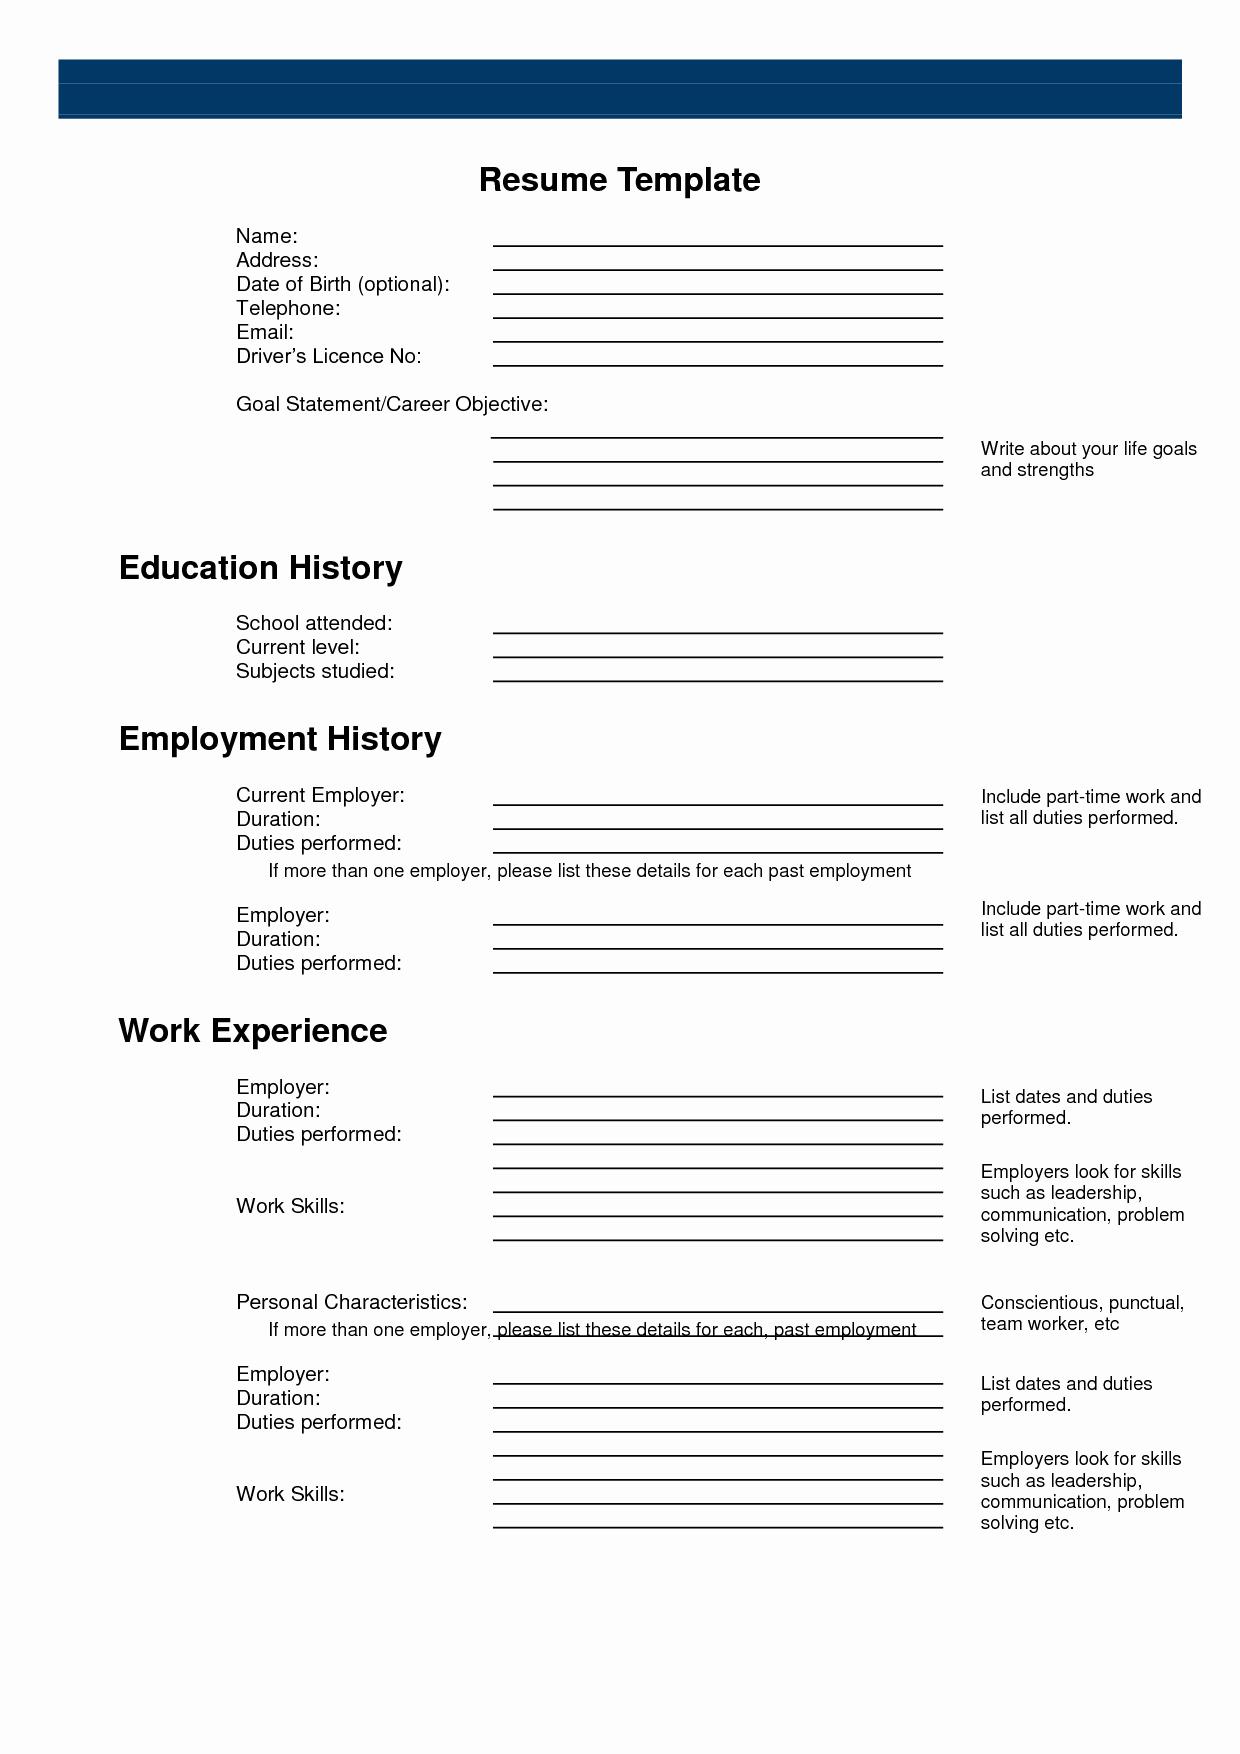 Free Printable Resume Templates Best Of Free Printable Sample Resume Templates